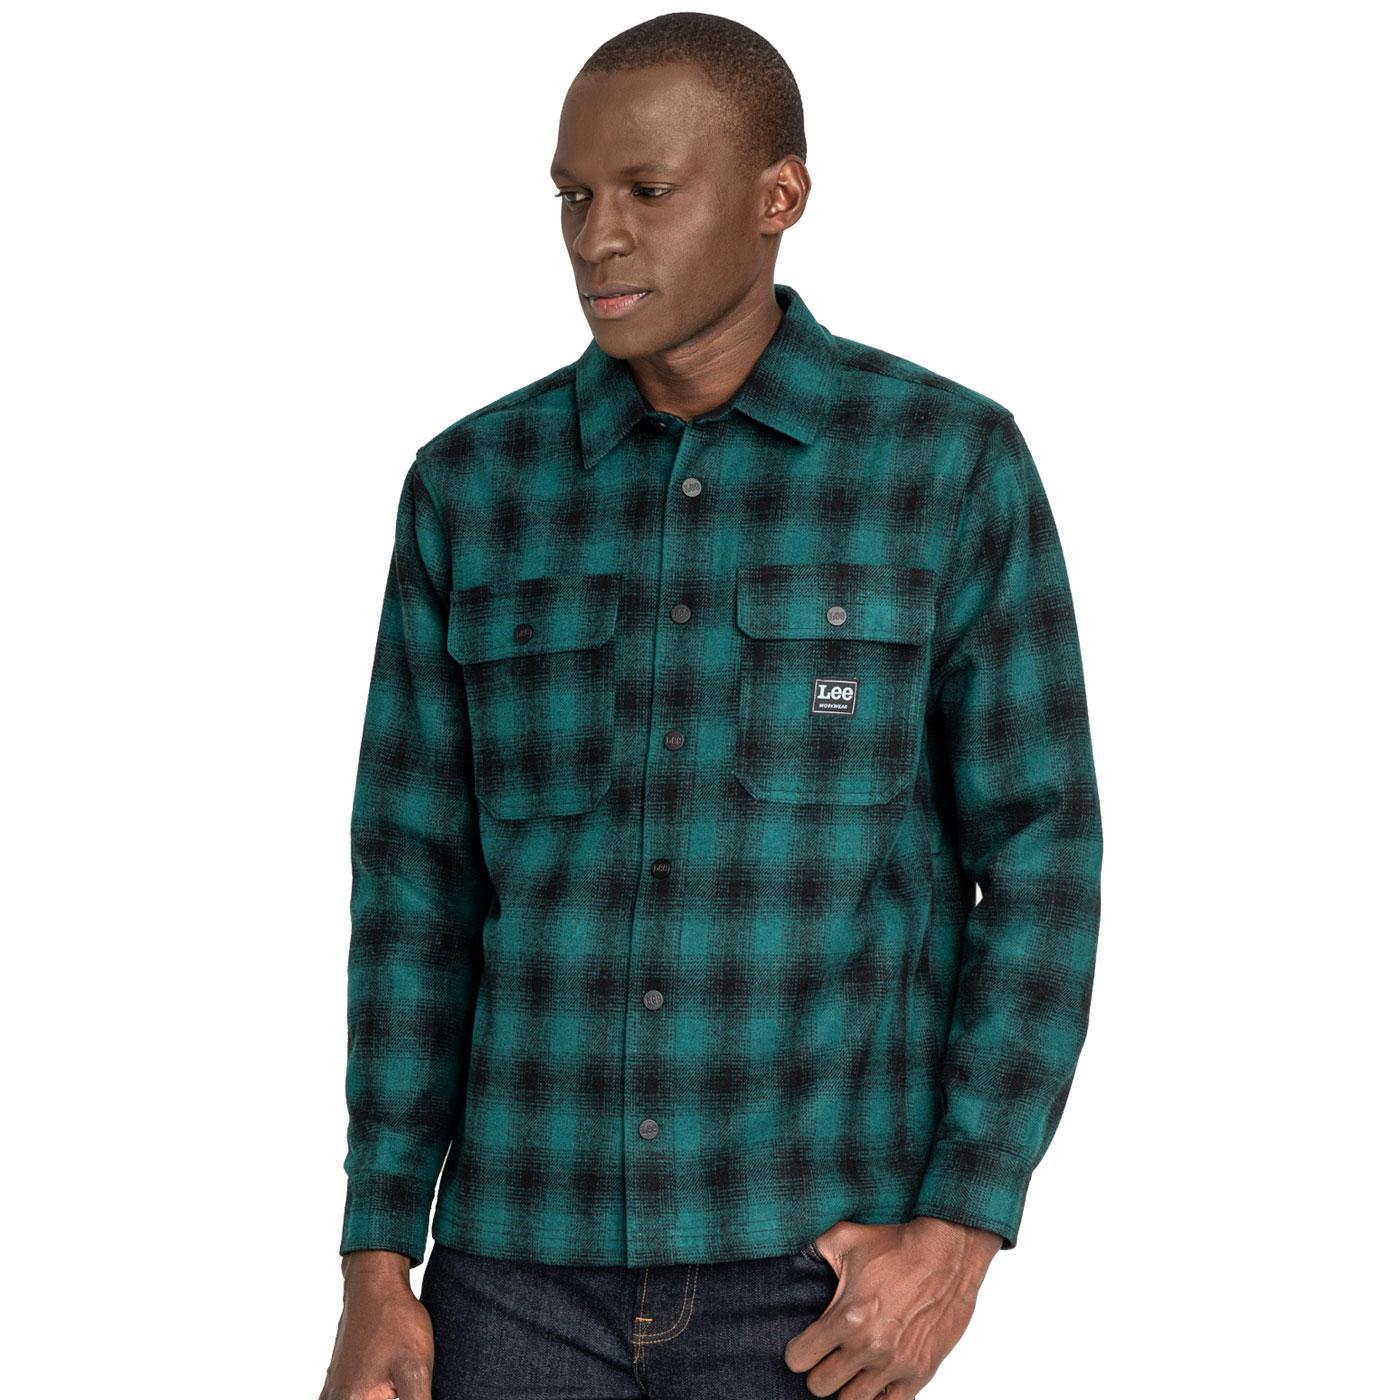 LEE JEANS Men's Retro Check Workwear Overshirt AG